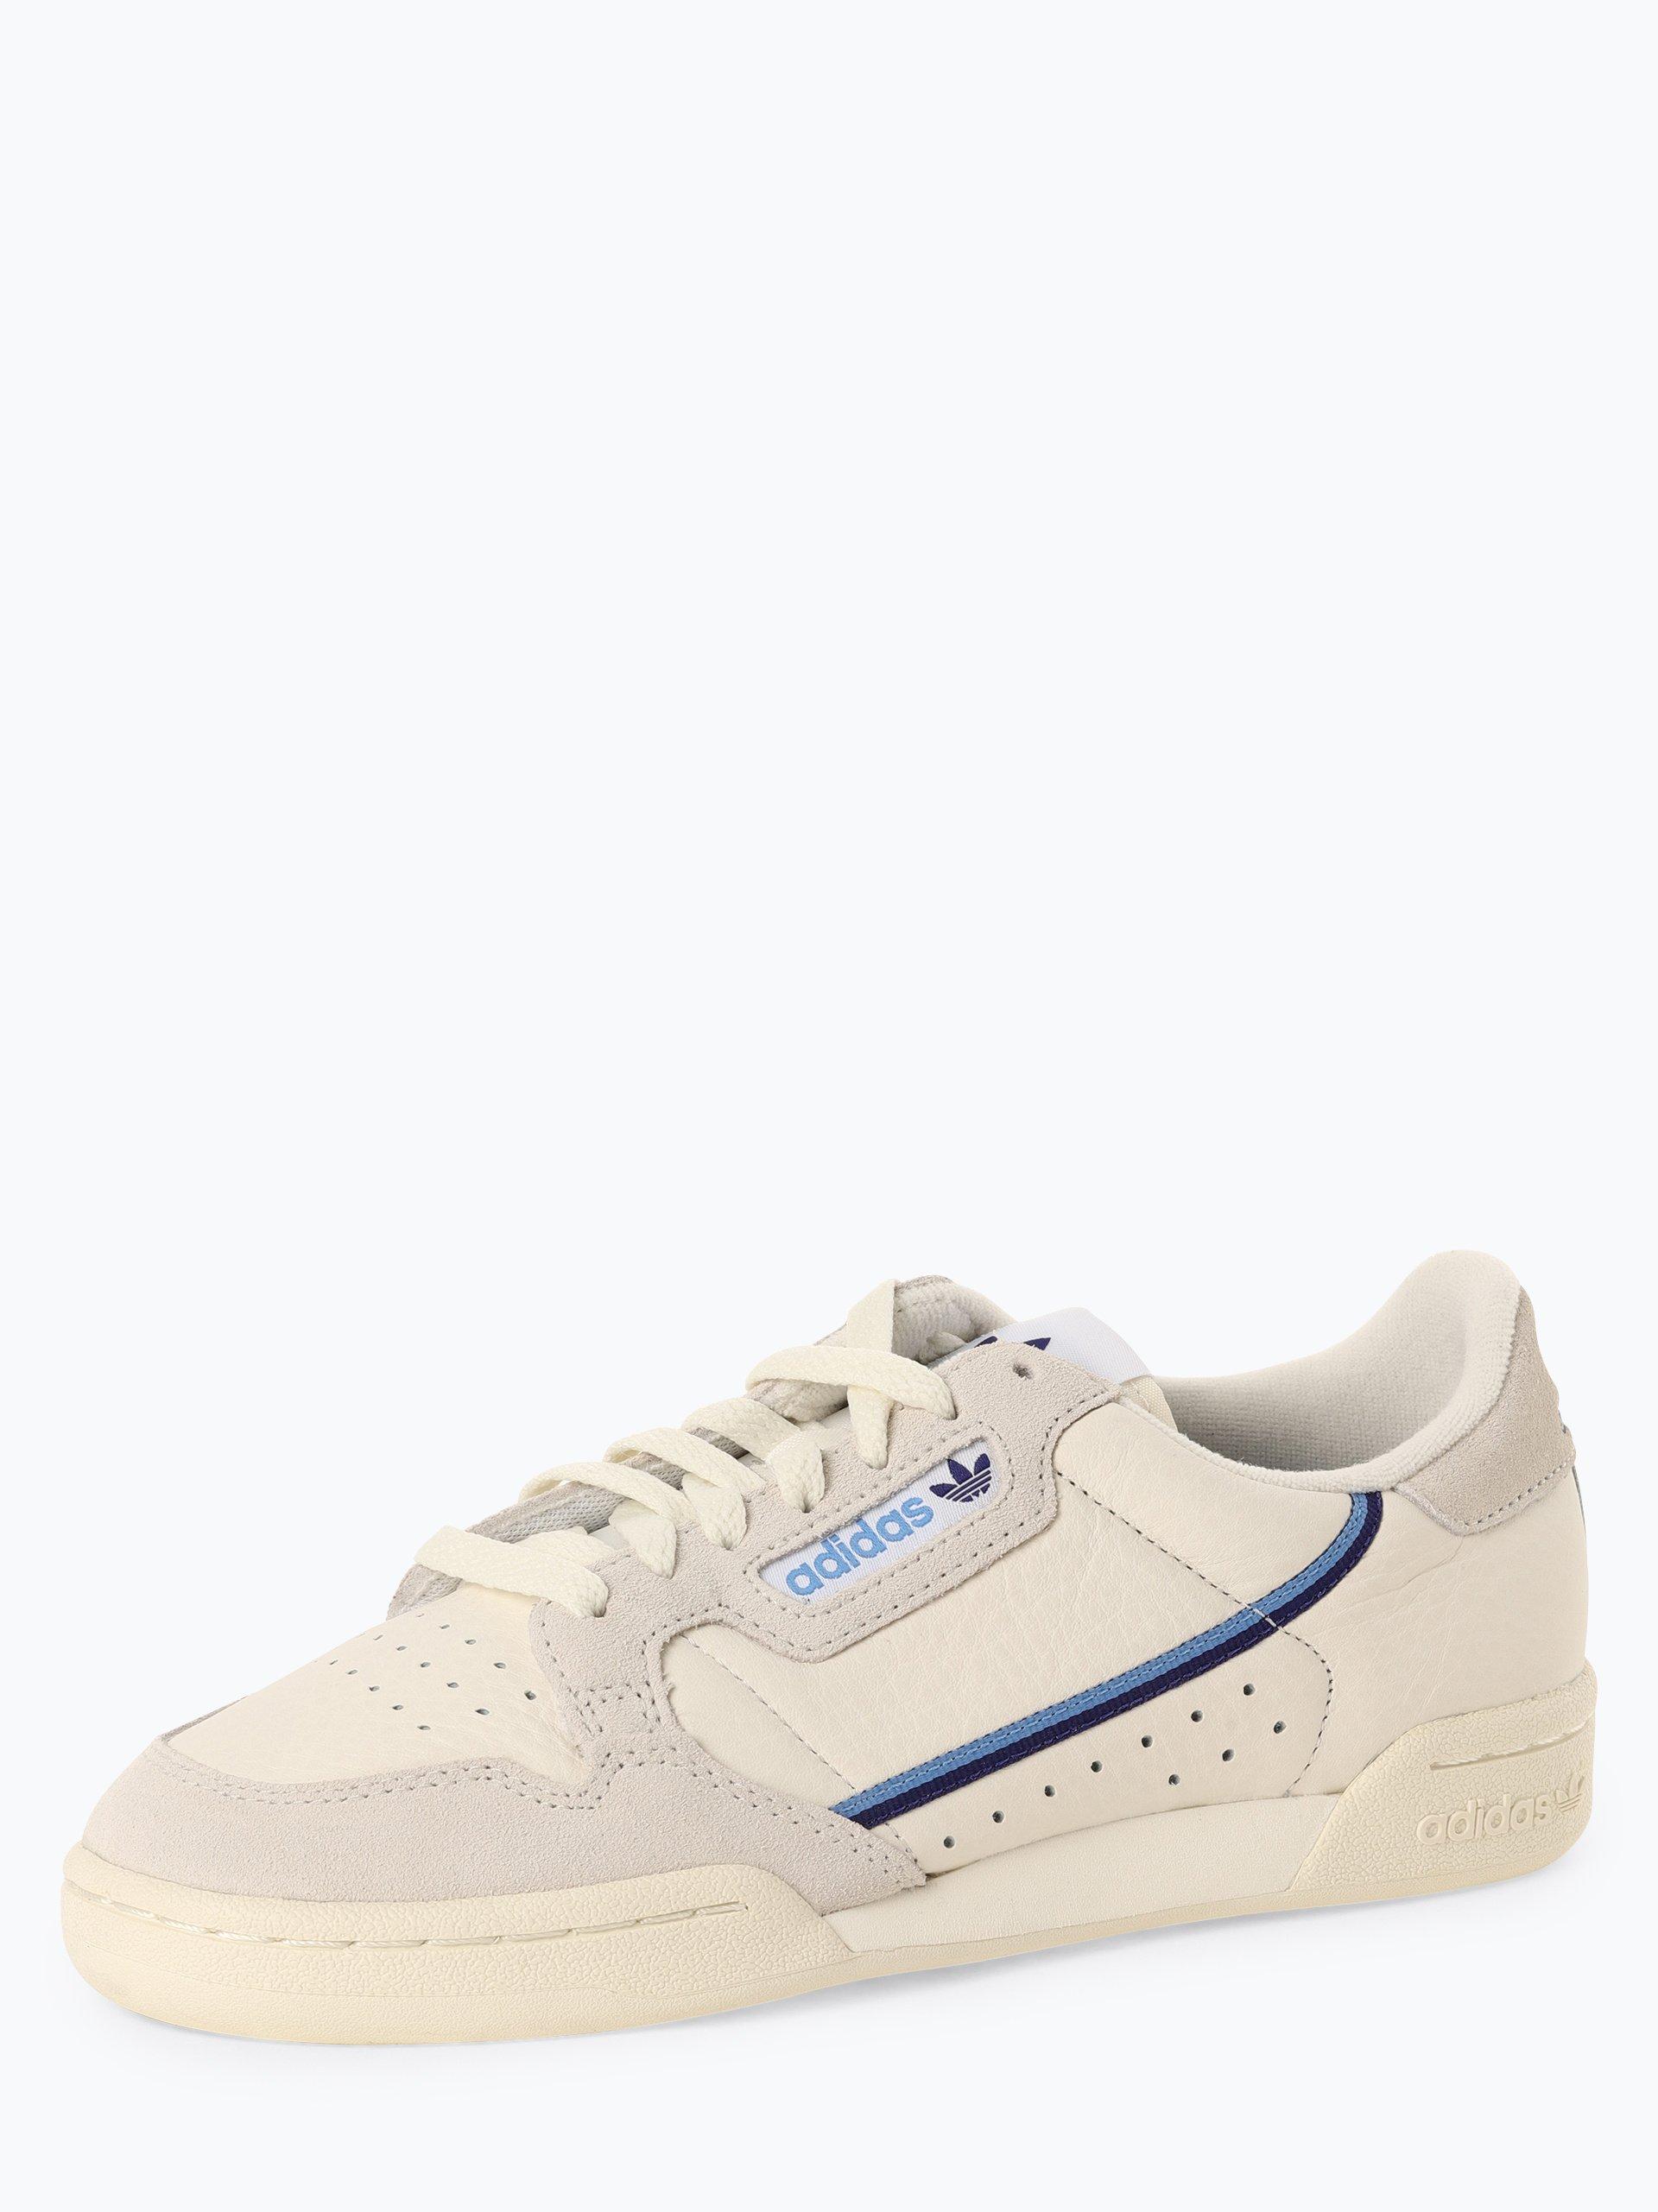 adidas Originals Damen Sneaker aus Leder - Continental 80 W